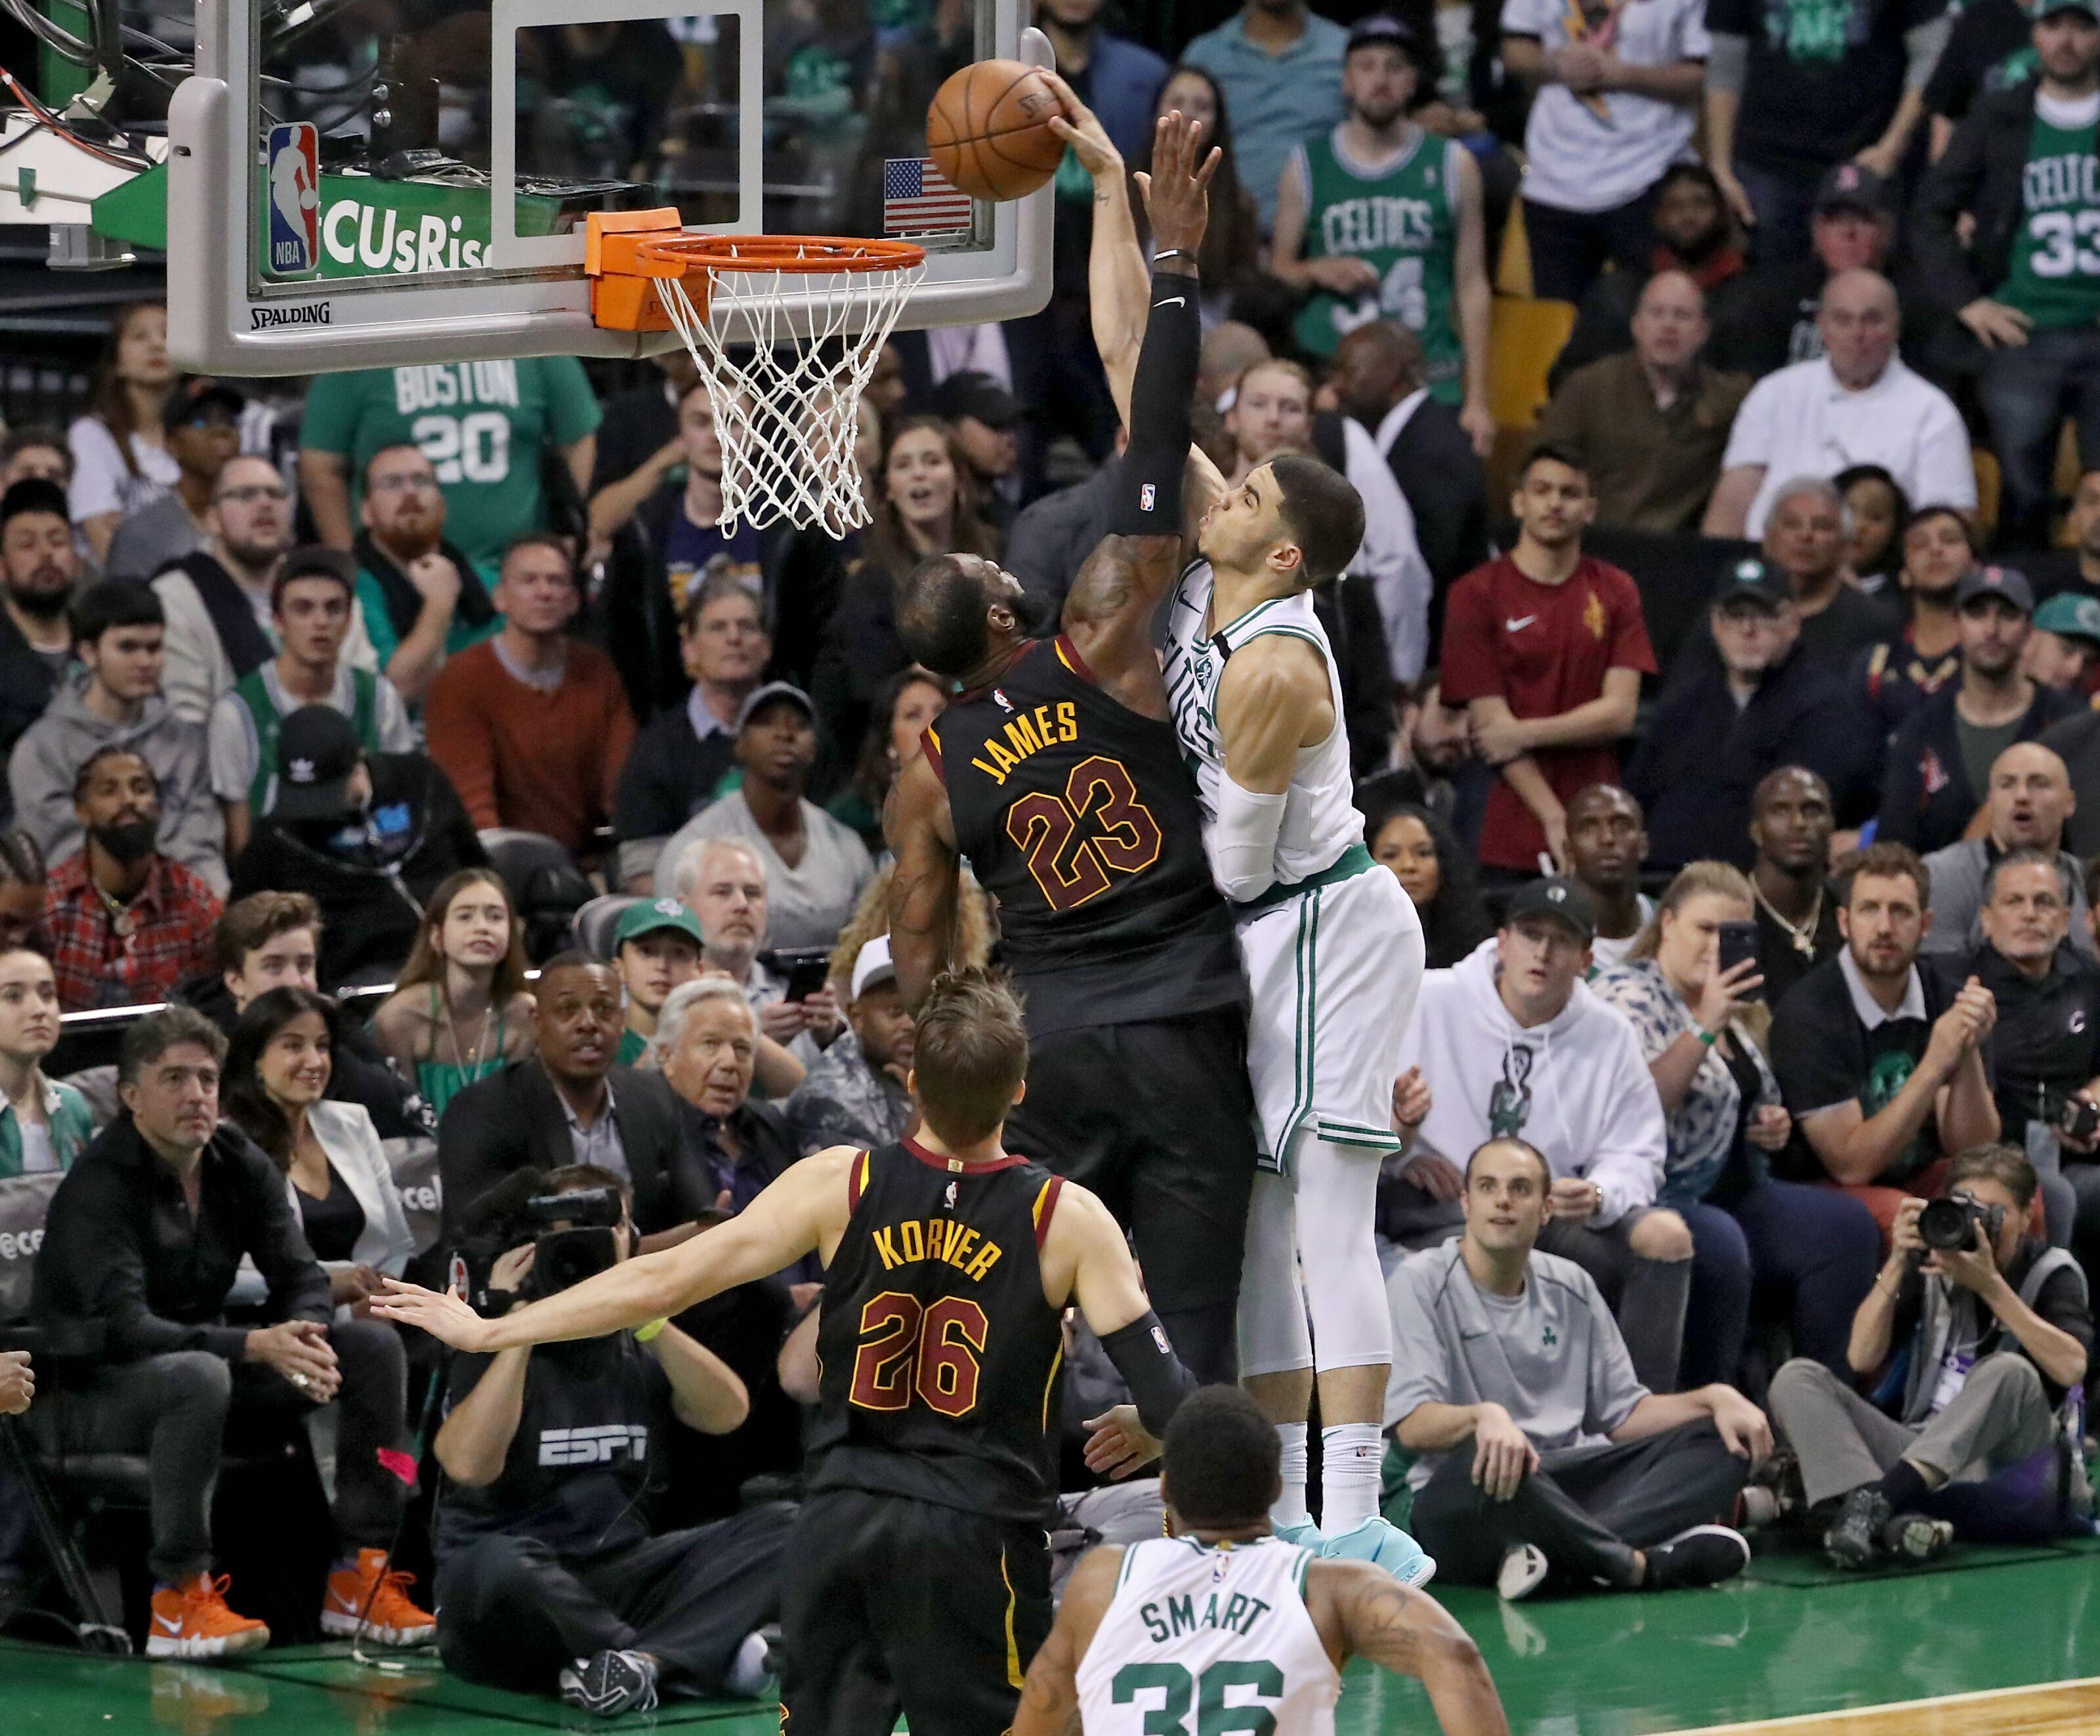 Boston Celtics: Playoff run puts Jayson Tatum at head of rookie class